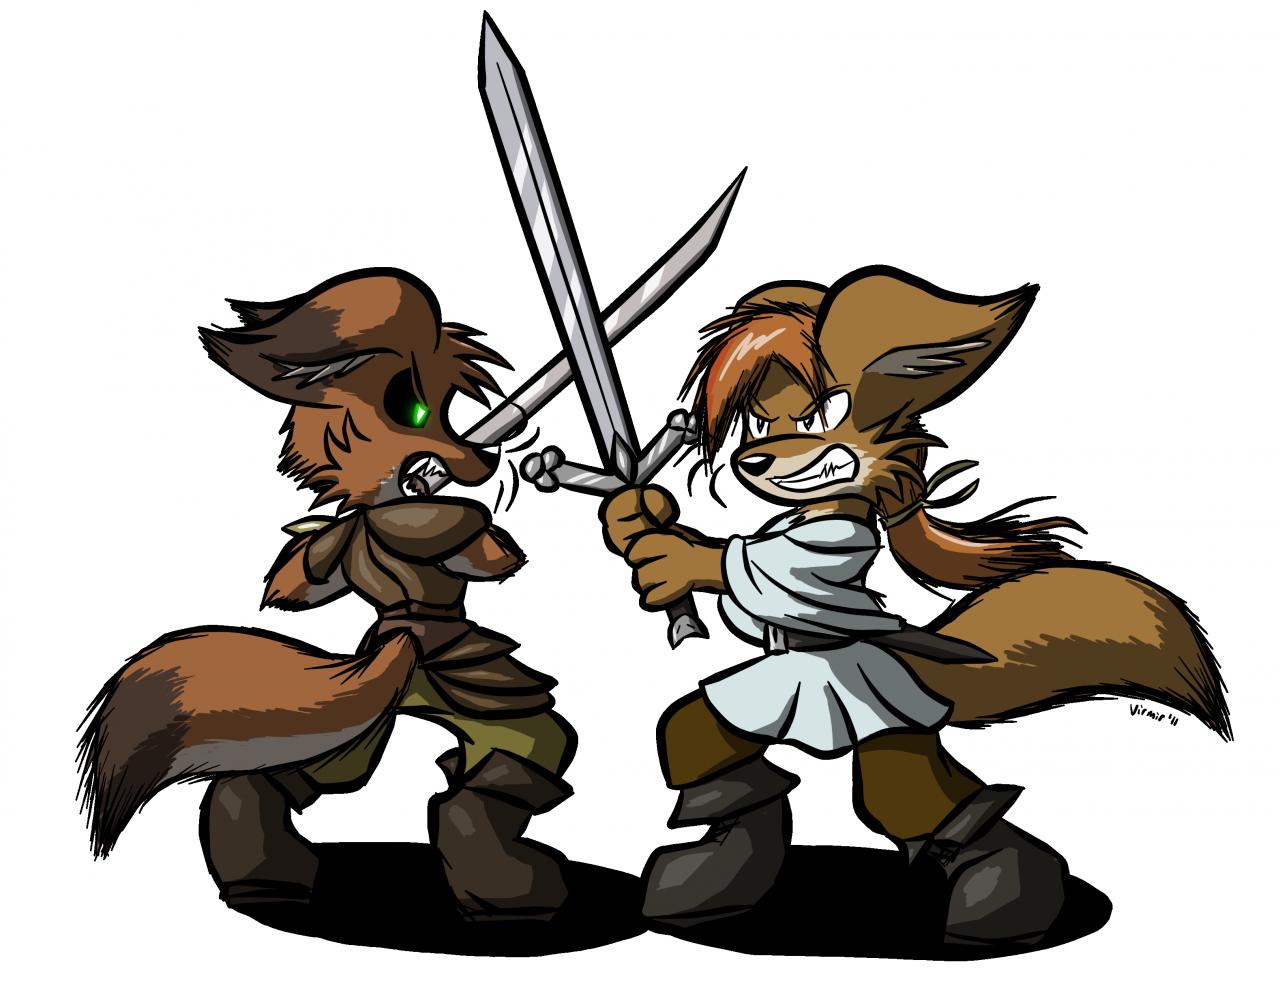 Fighting clipart sword. Art by virmir fight